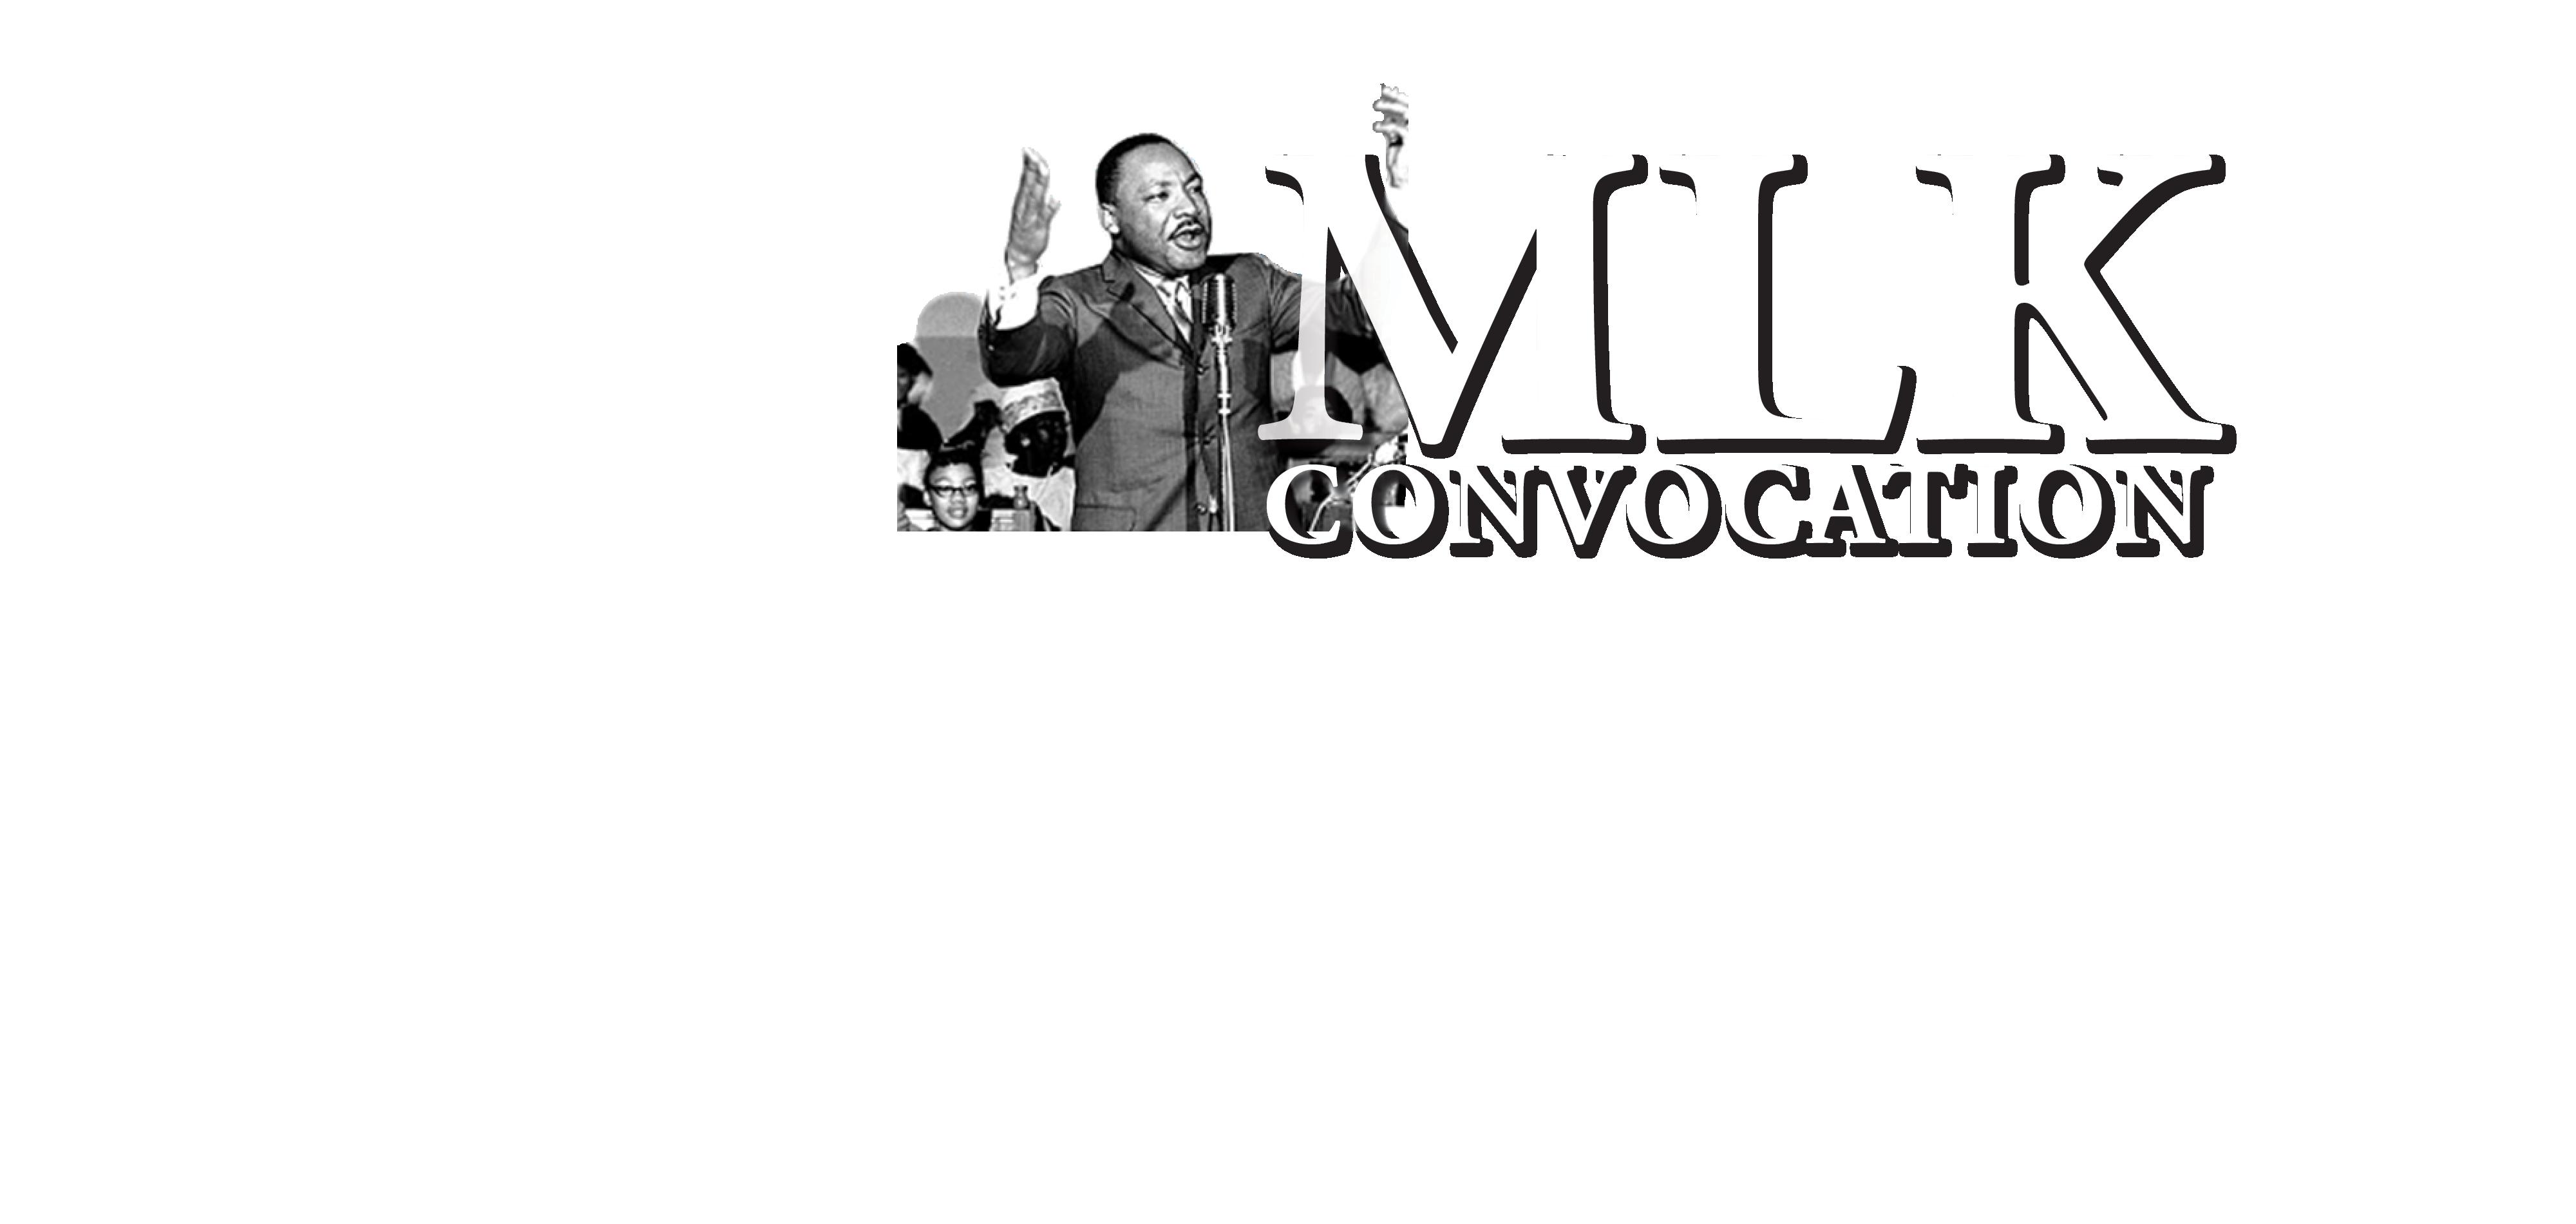 https://www.alasu.edu/sites/default/files/revslider/image/mlk20_logo4.png